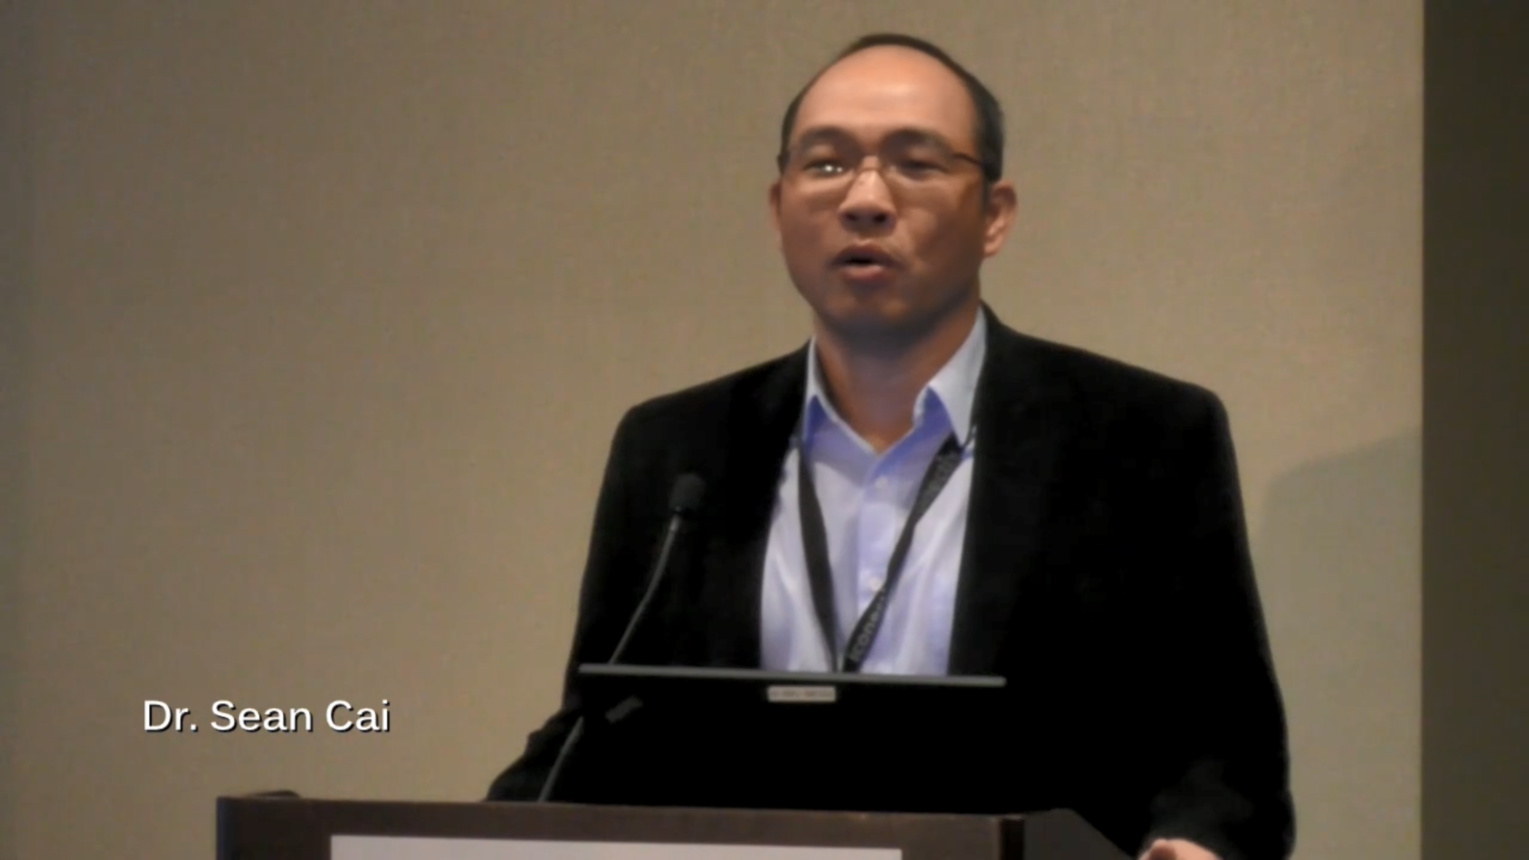 5G Development for Digital Transformation - Dr. Sean Cai, ZTE